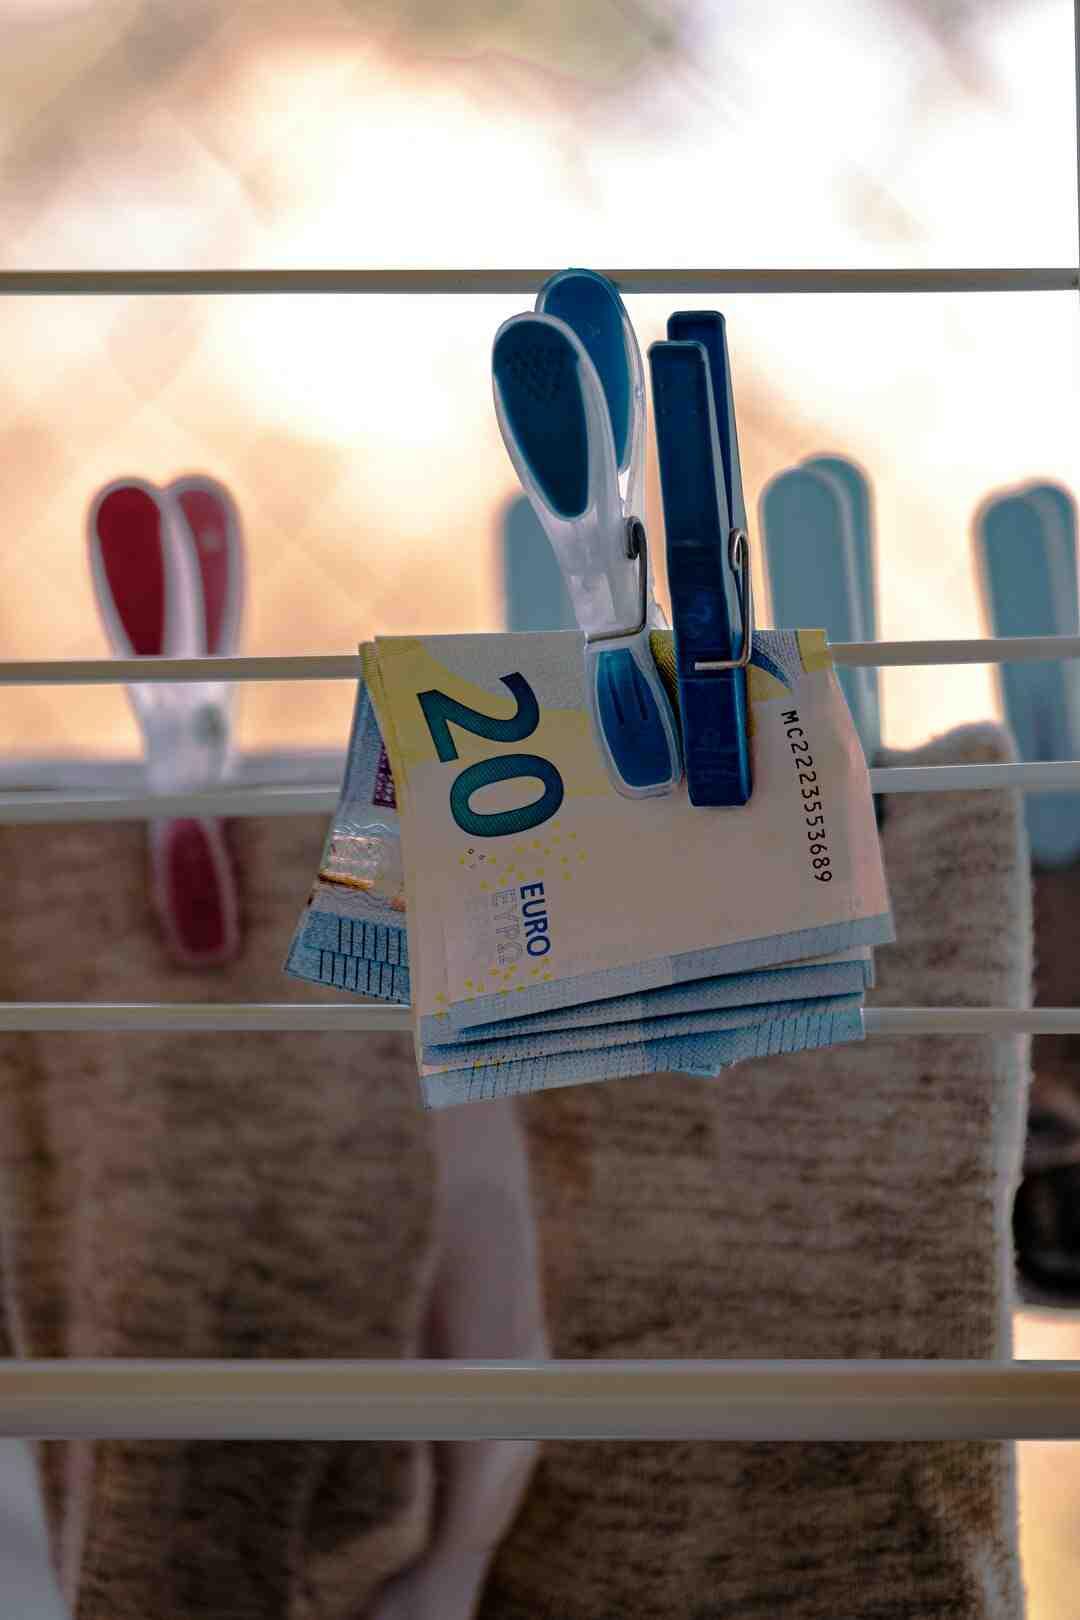 Comment gagner 20 000 euros ?